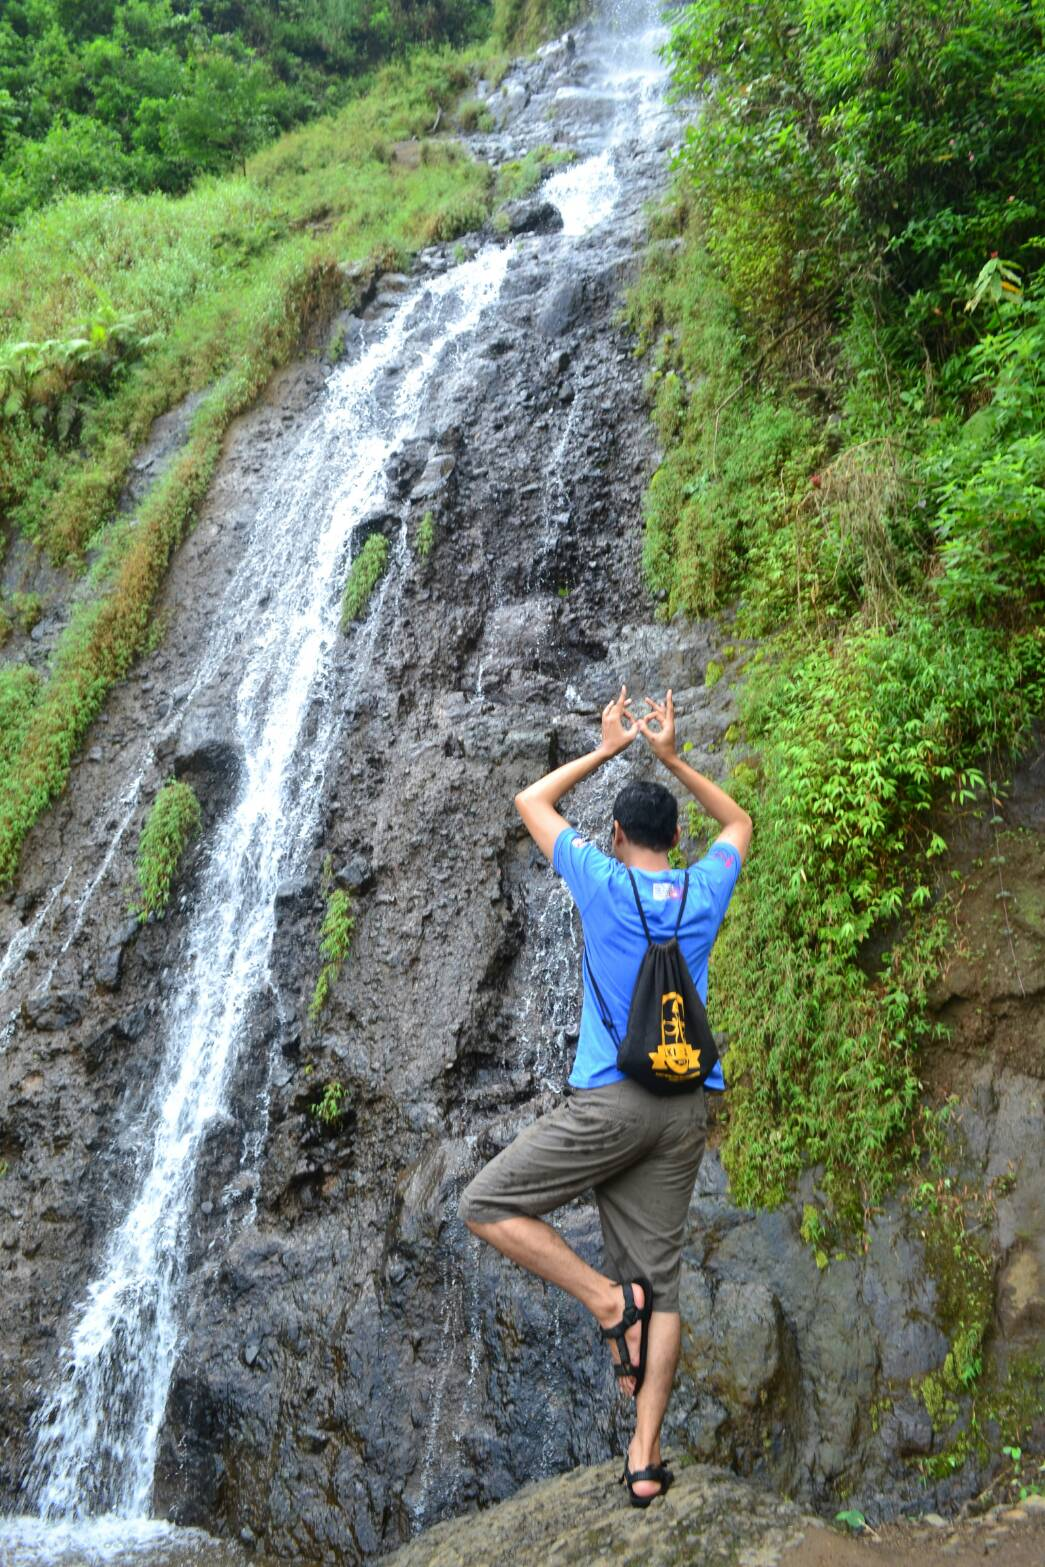 Golek Wangsit Curug Gunung Putri Bruno Purworejo